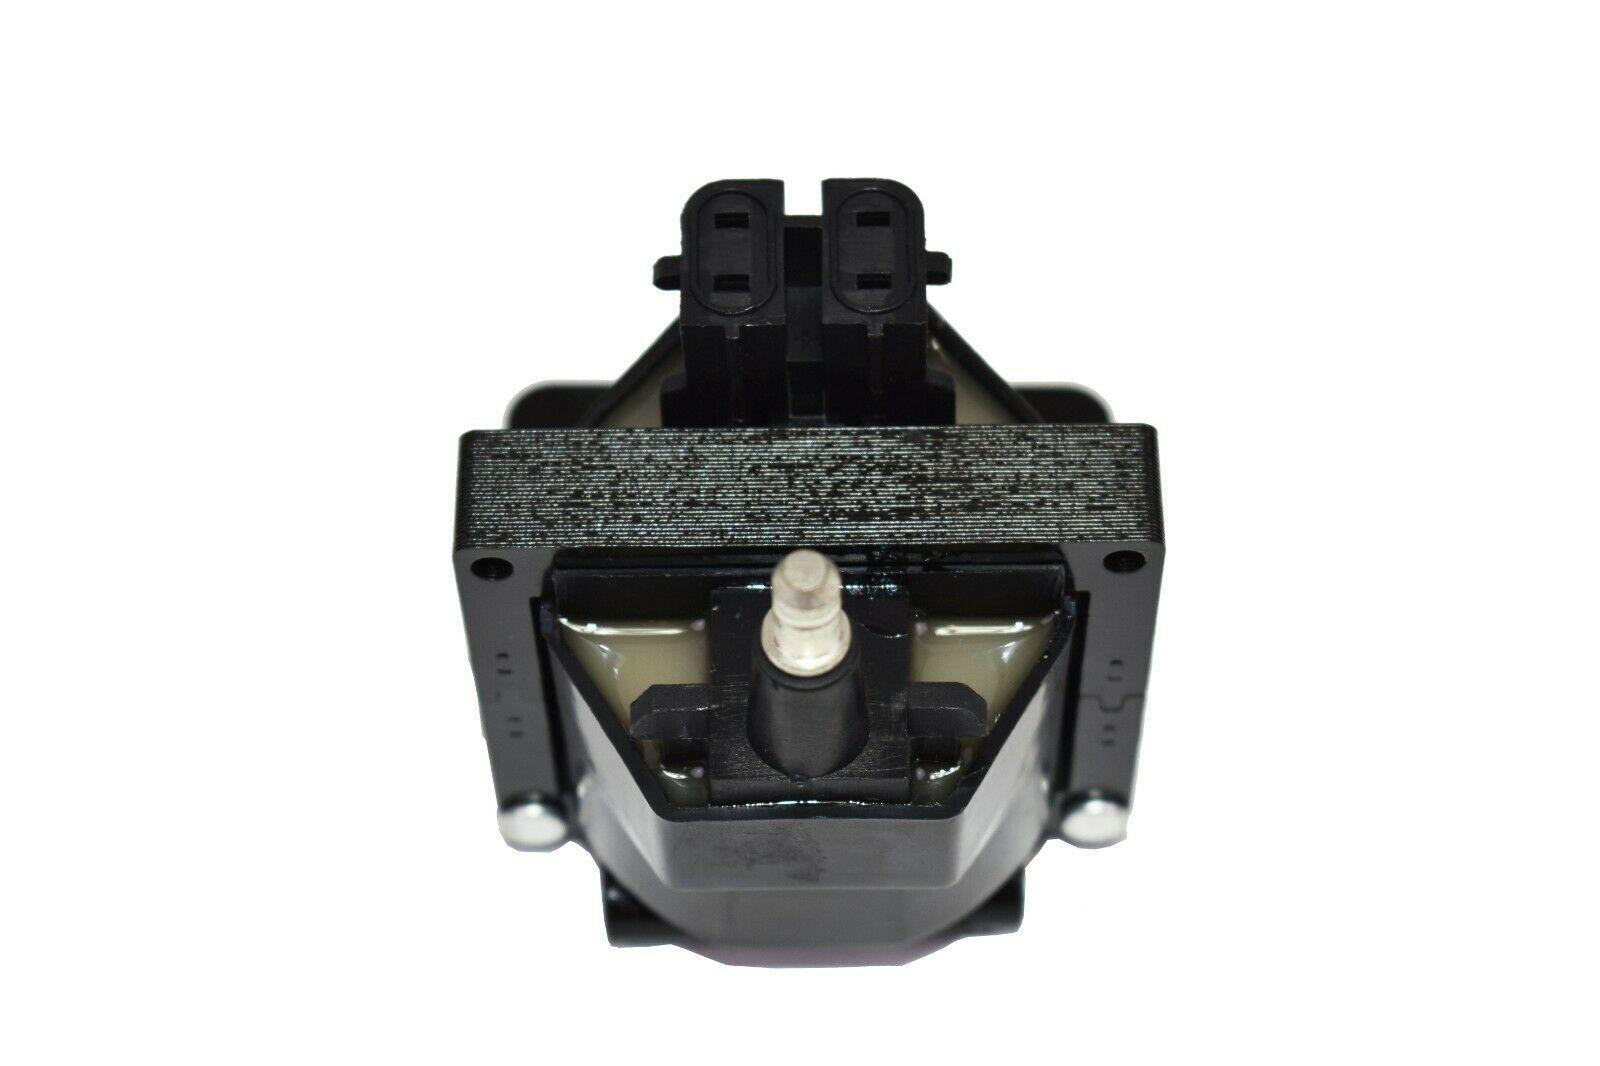 OMC MerCruiser 3.0L 4Cyl 4.3L V6 5.3L 5.7L Marine Ignition Coil 18-5443 817378